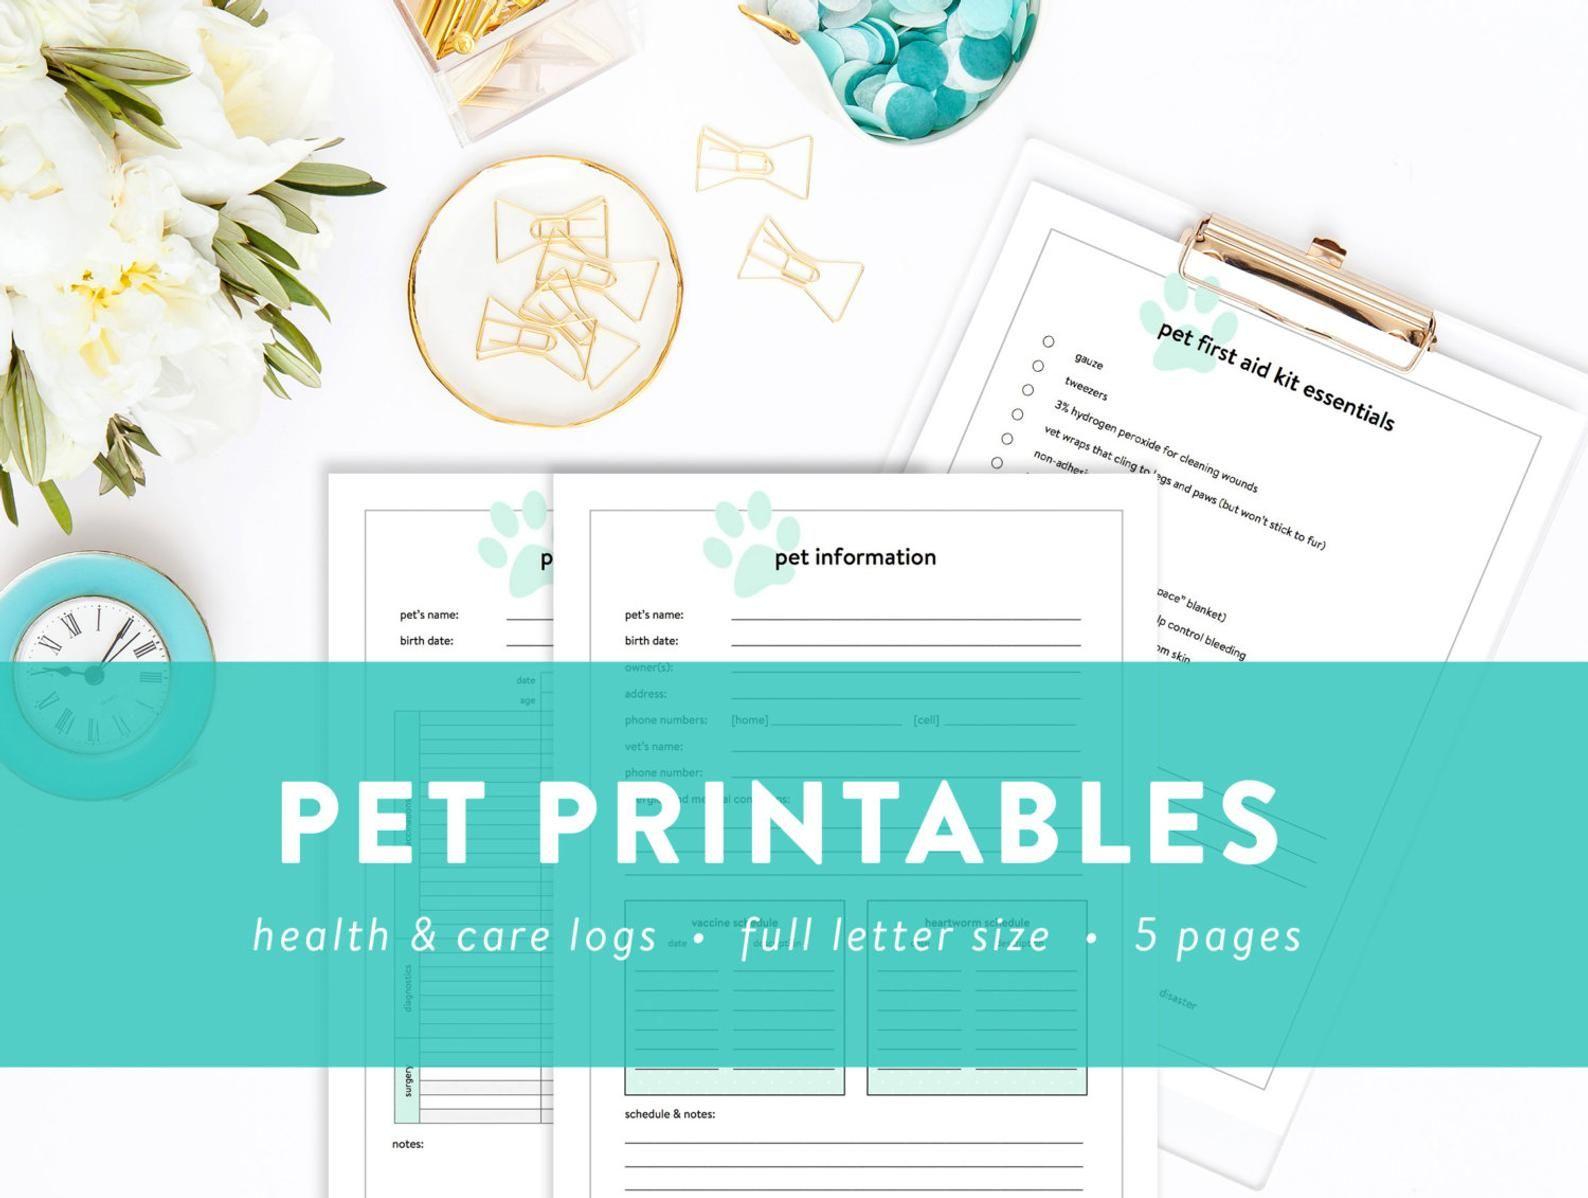 Pet Printables